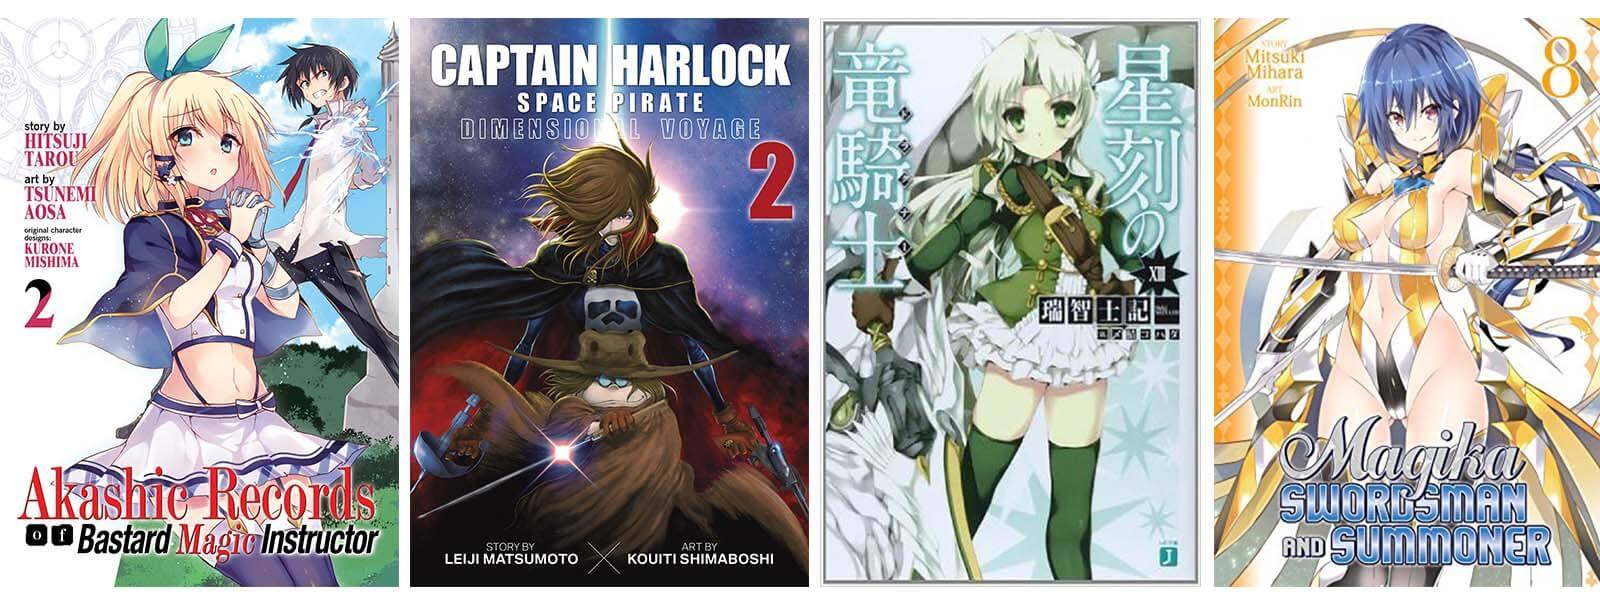 December 2017 Manga Release